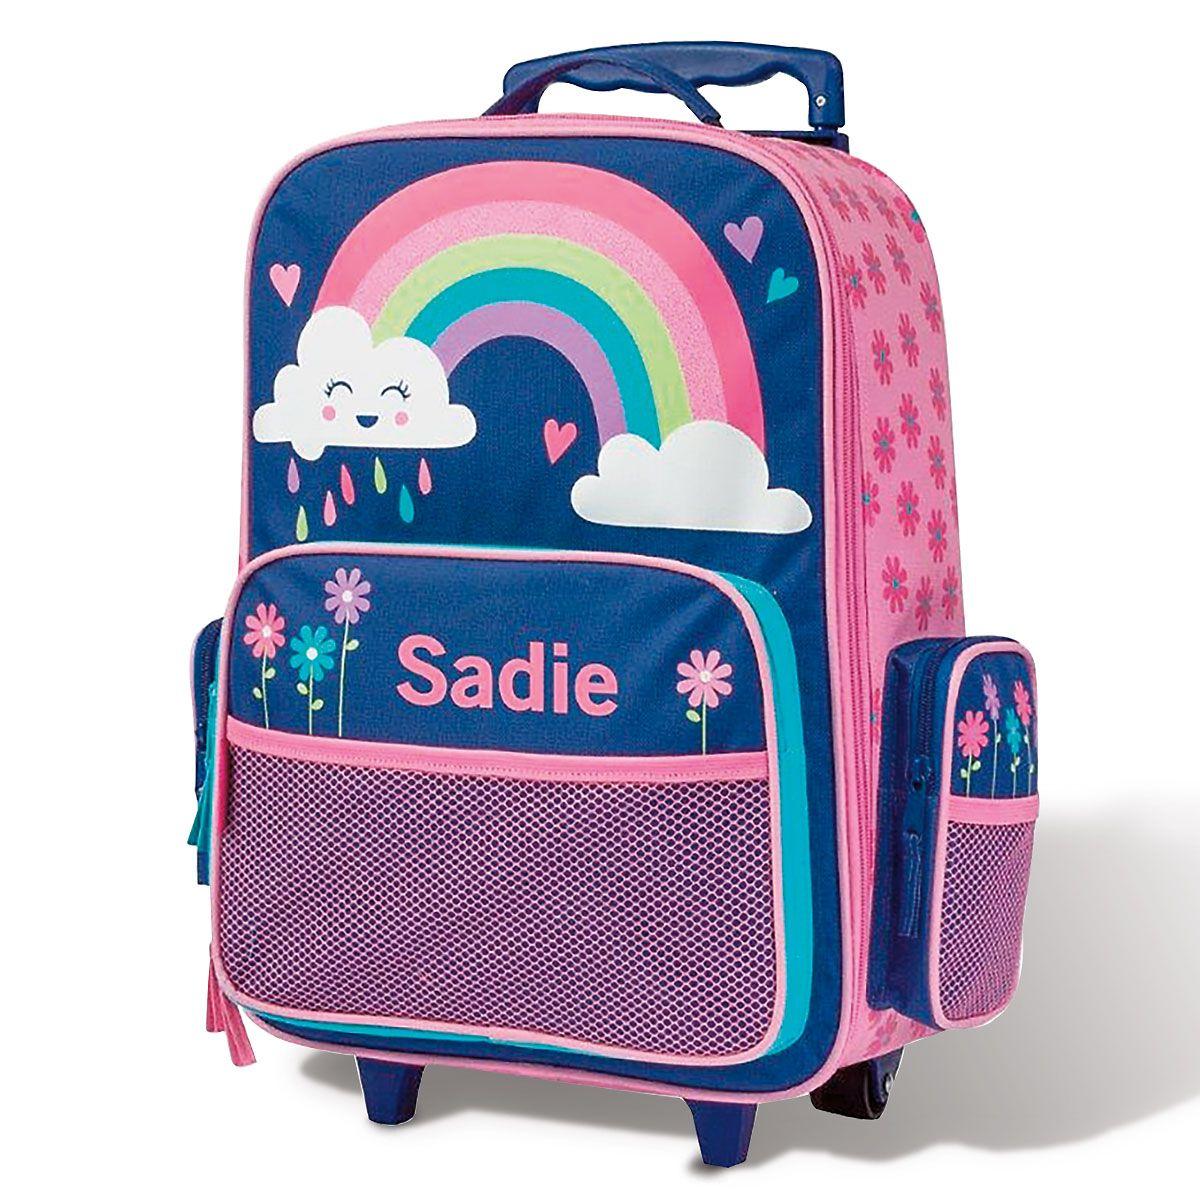 "Custom 18"" Rainbow Rolling Luggage by Stephen Joseph®"